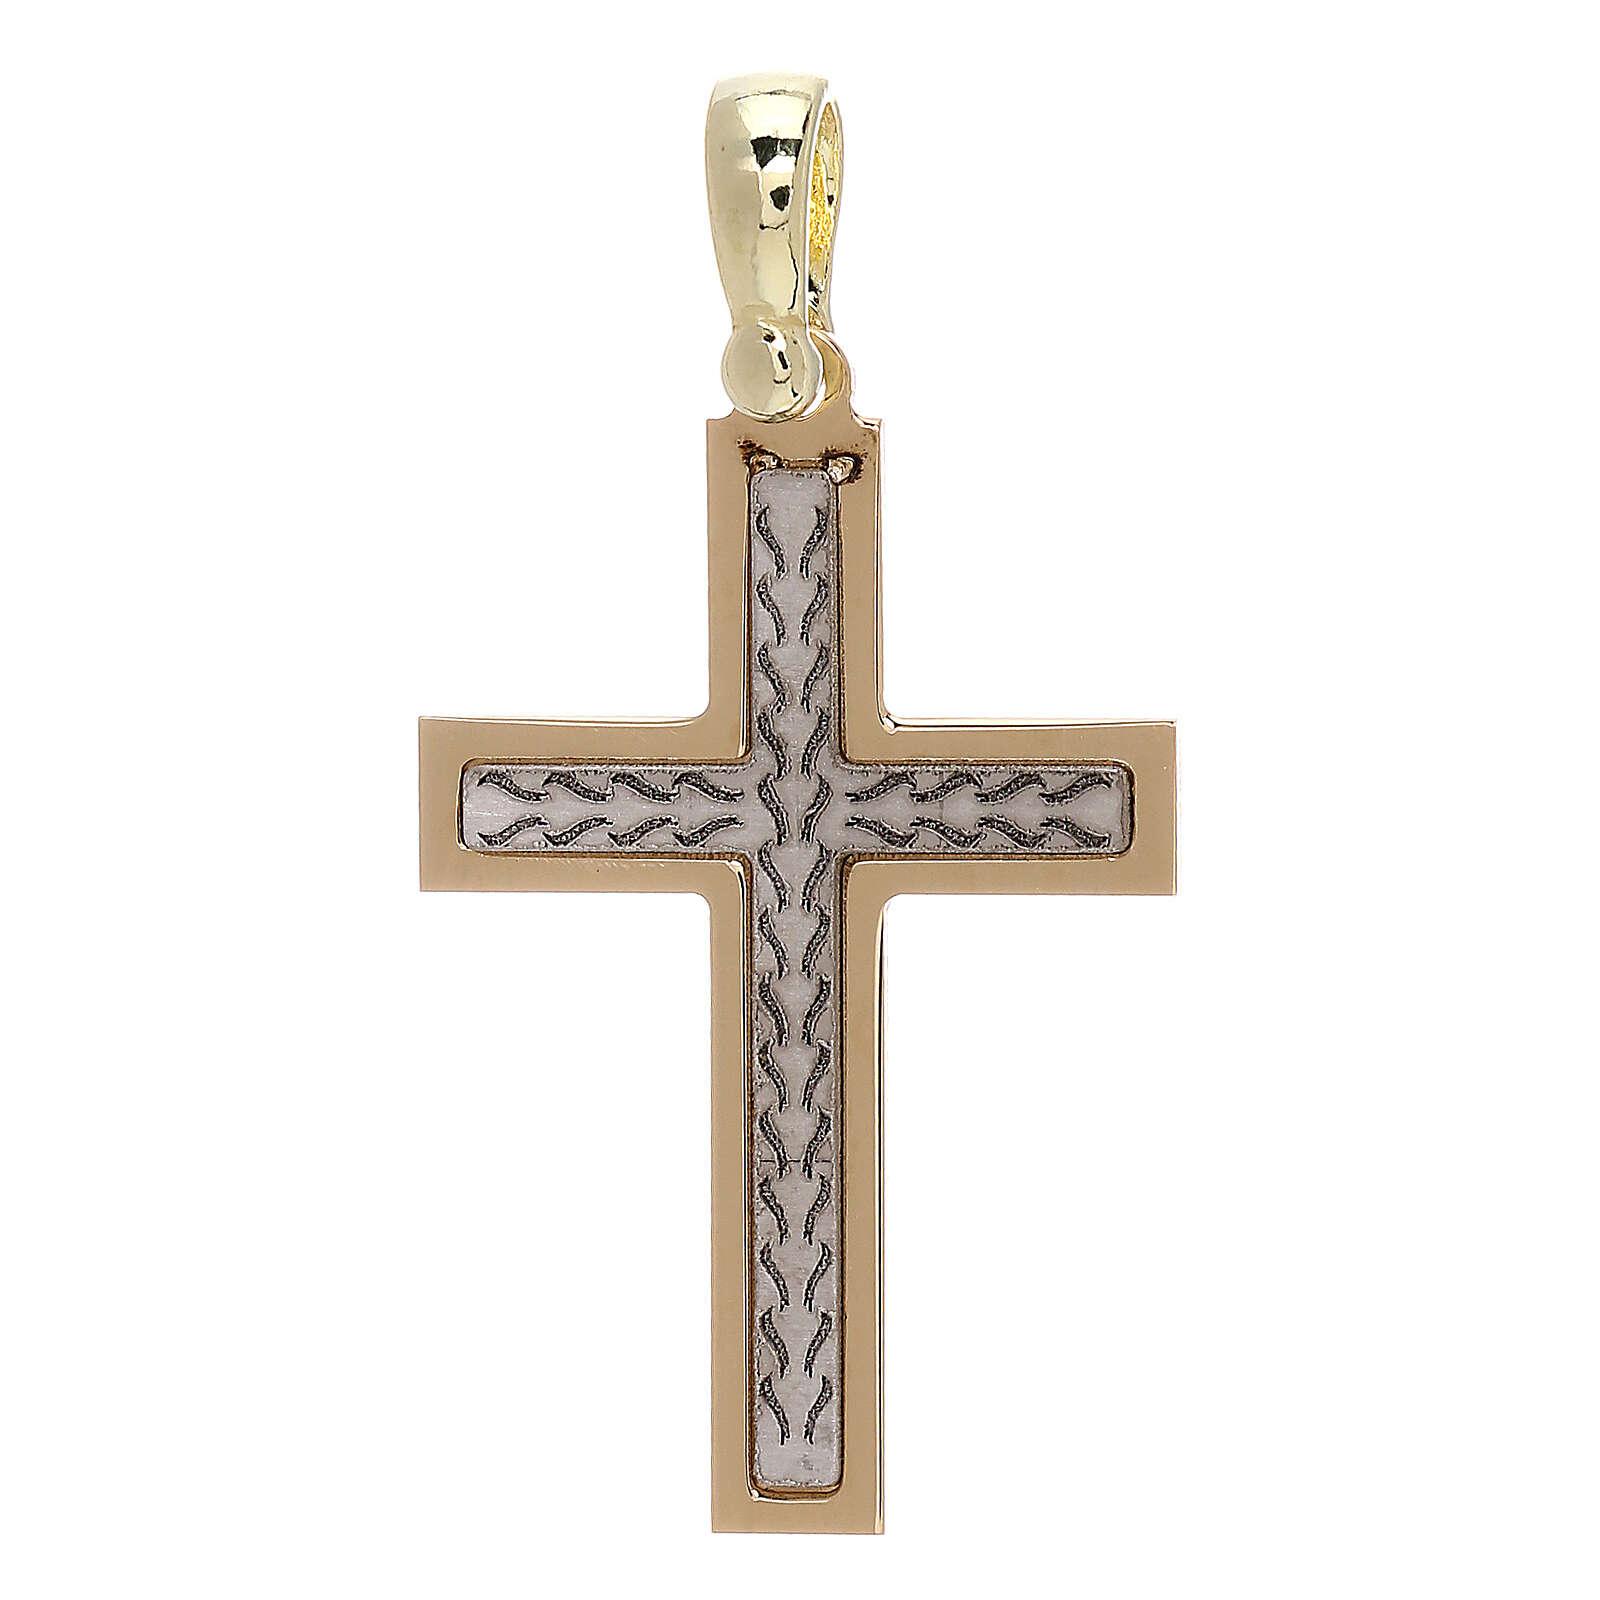 Croix avec gravure tresse or 18K 2,03 gr 4